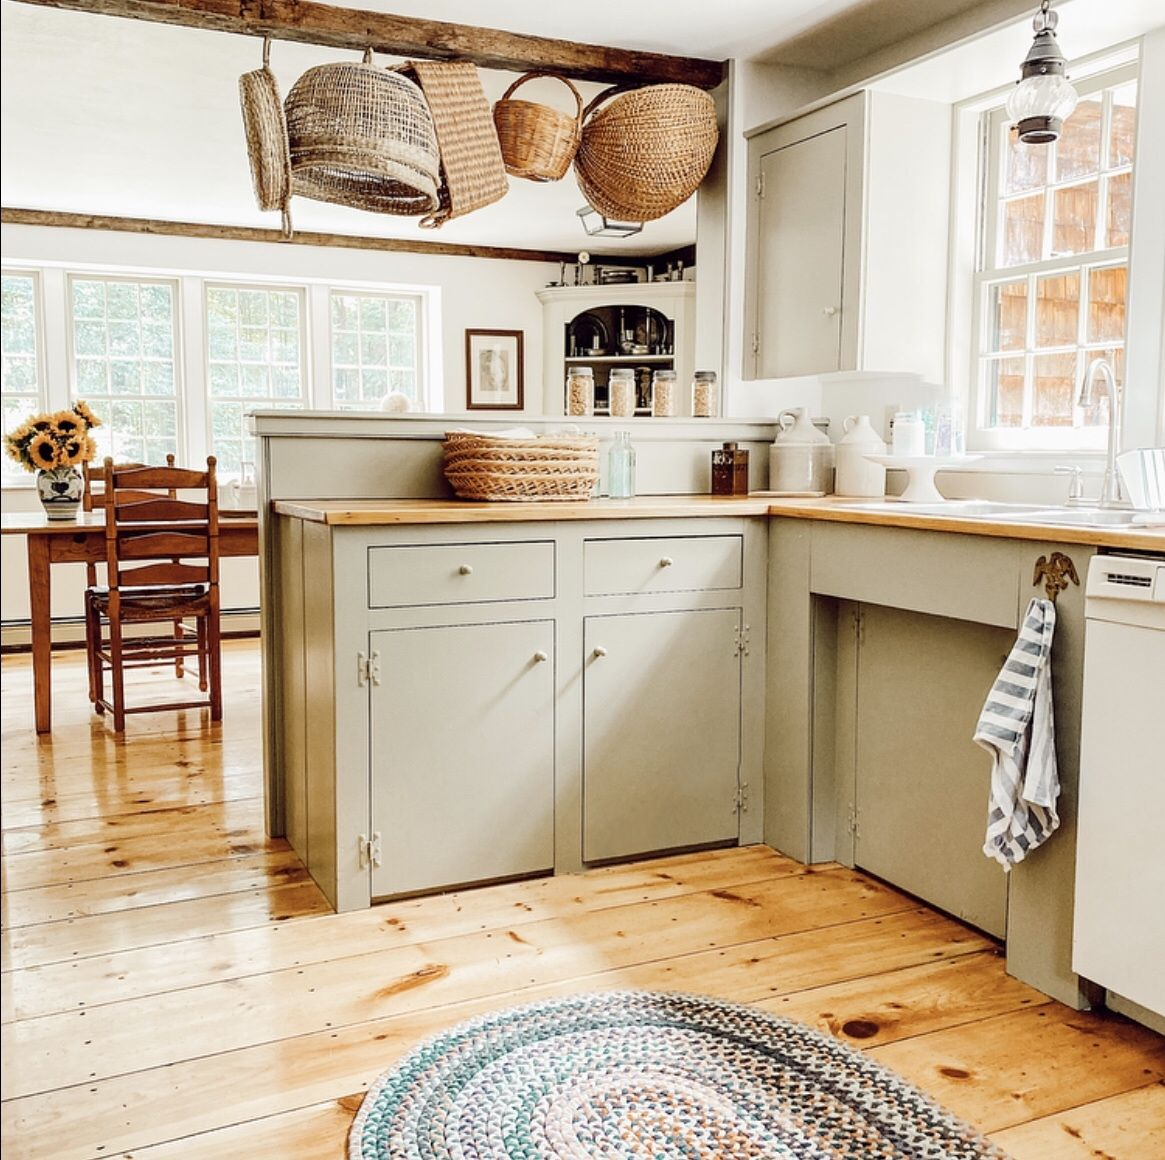 Old Colonial Kitchen In 2020 Colonial Kitchen Kitchen Design Kitchen Remodel